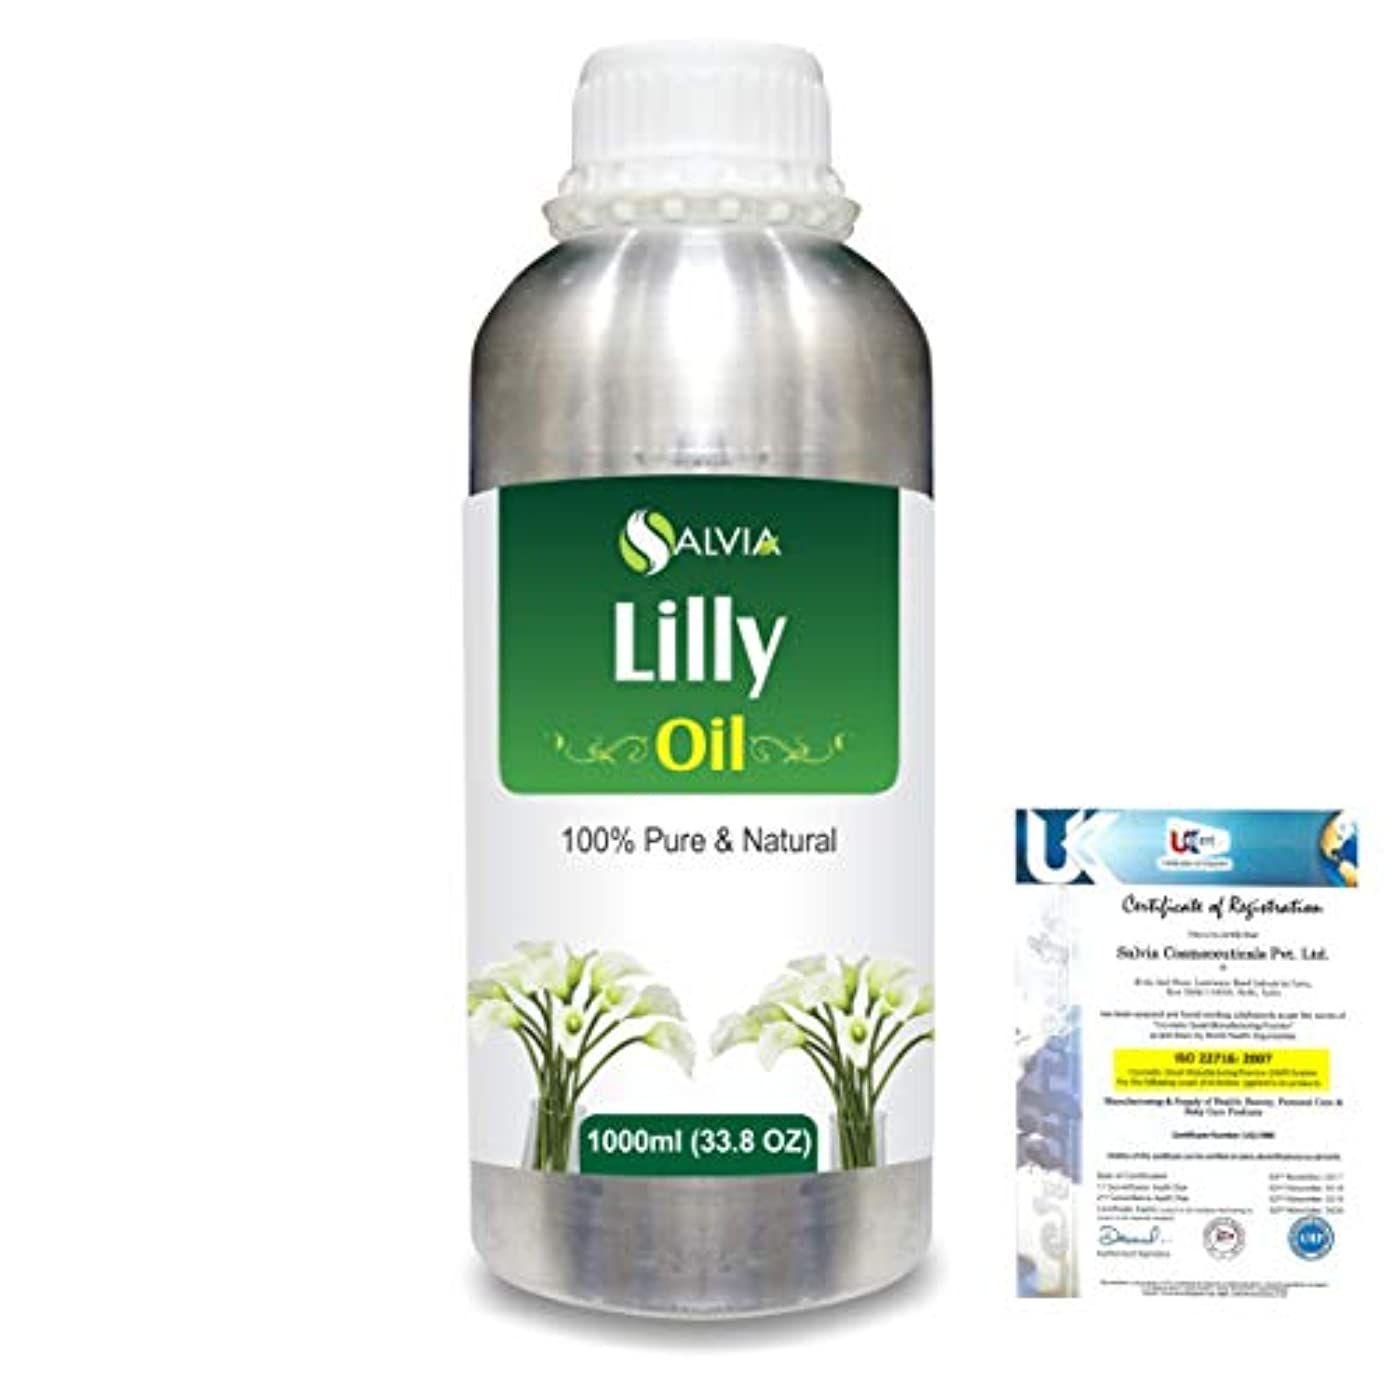 Lilly (Lilium auratum) 100% Natural Pure Essential Oil 1000ml/33.8fl.oz.